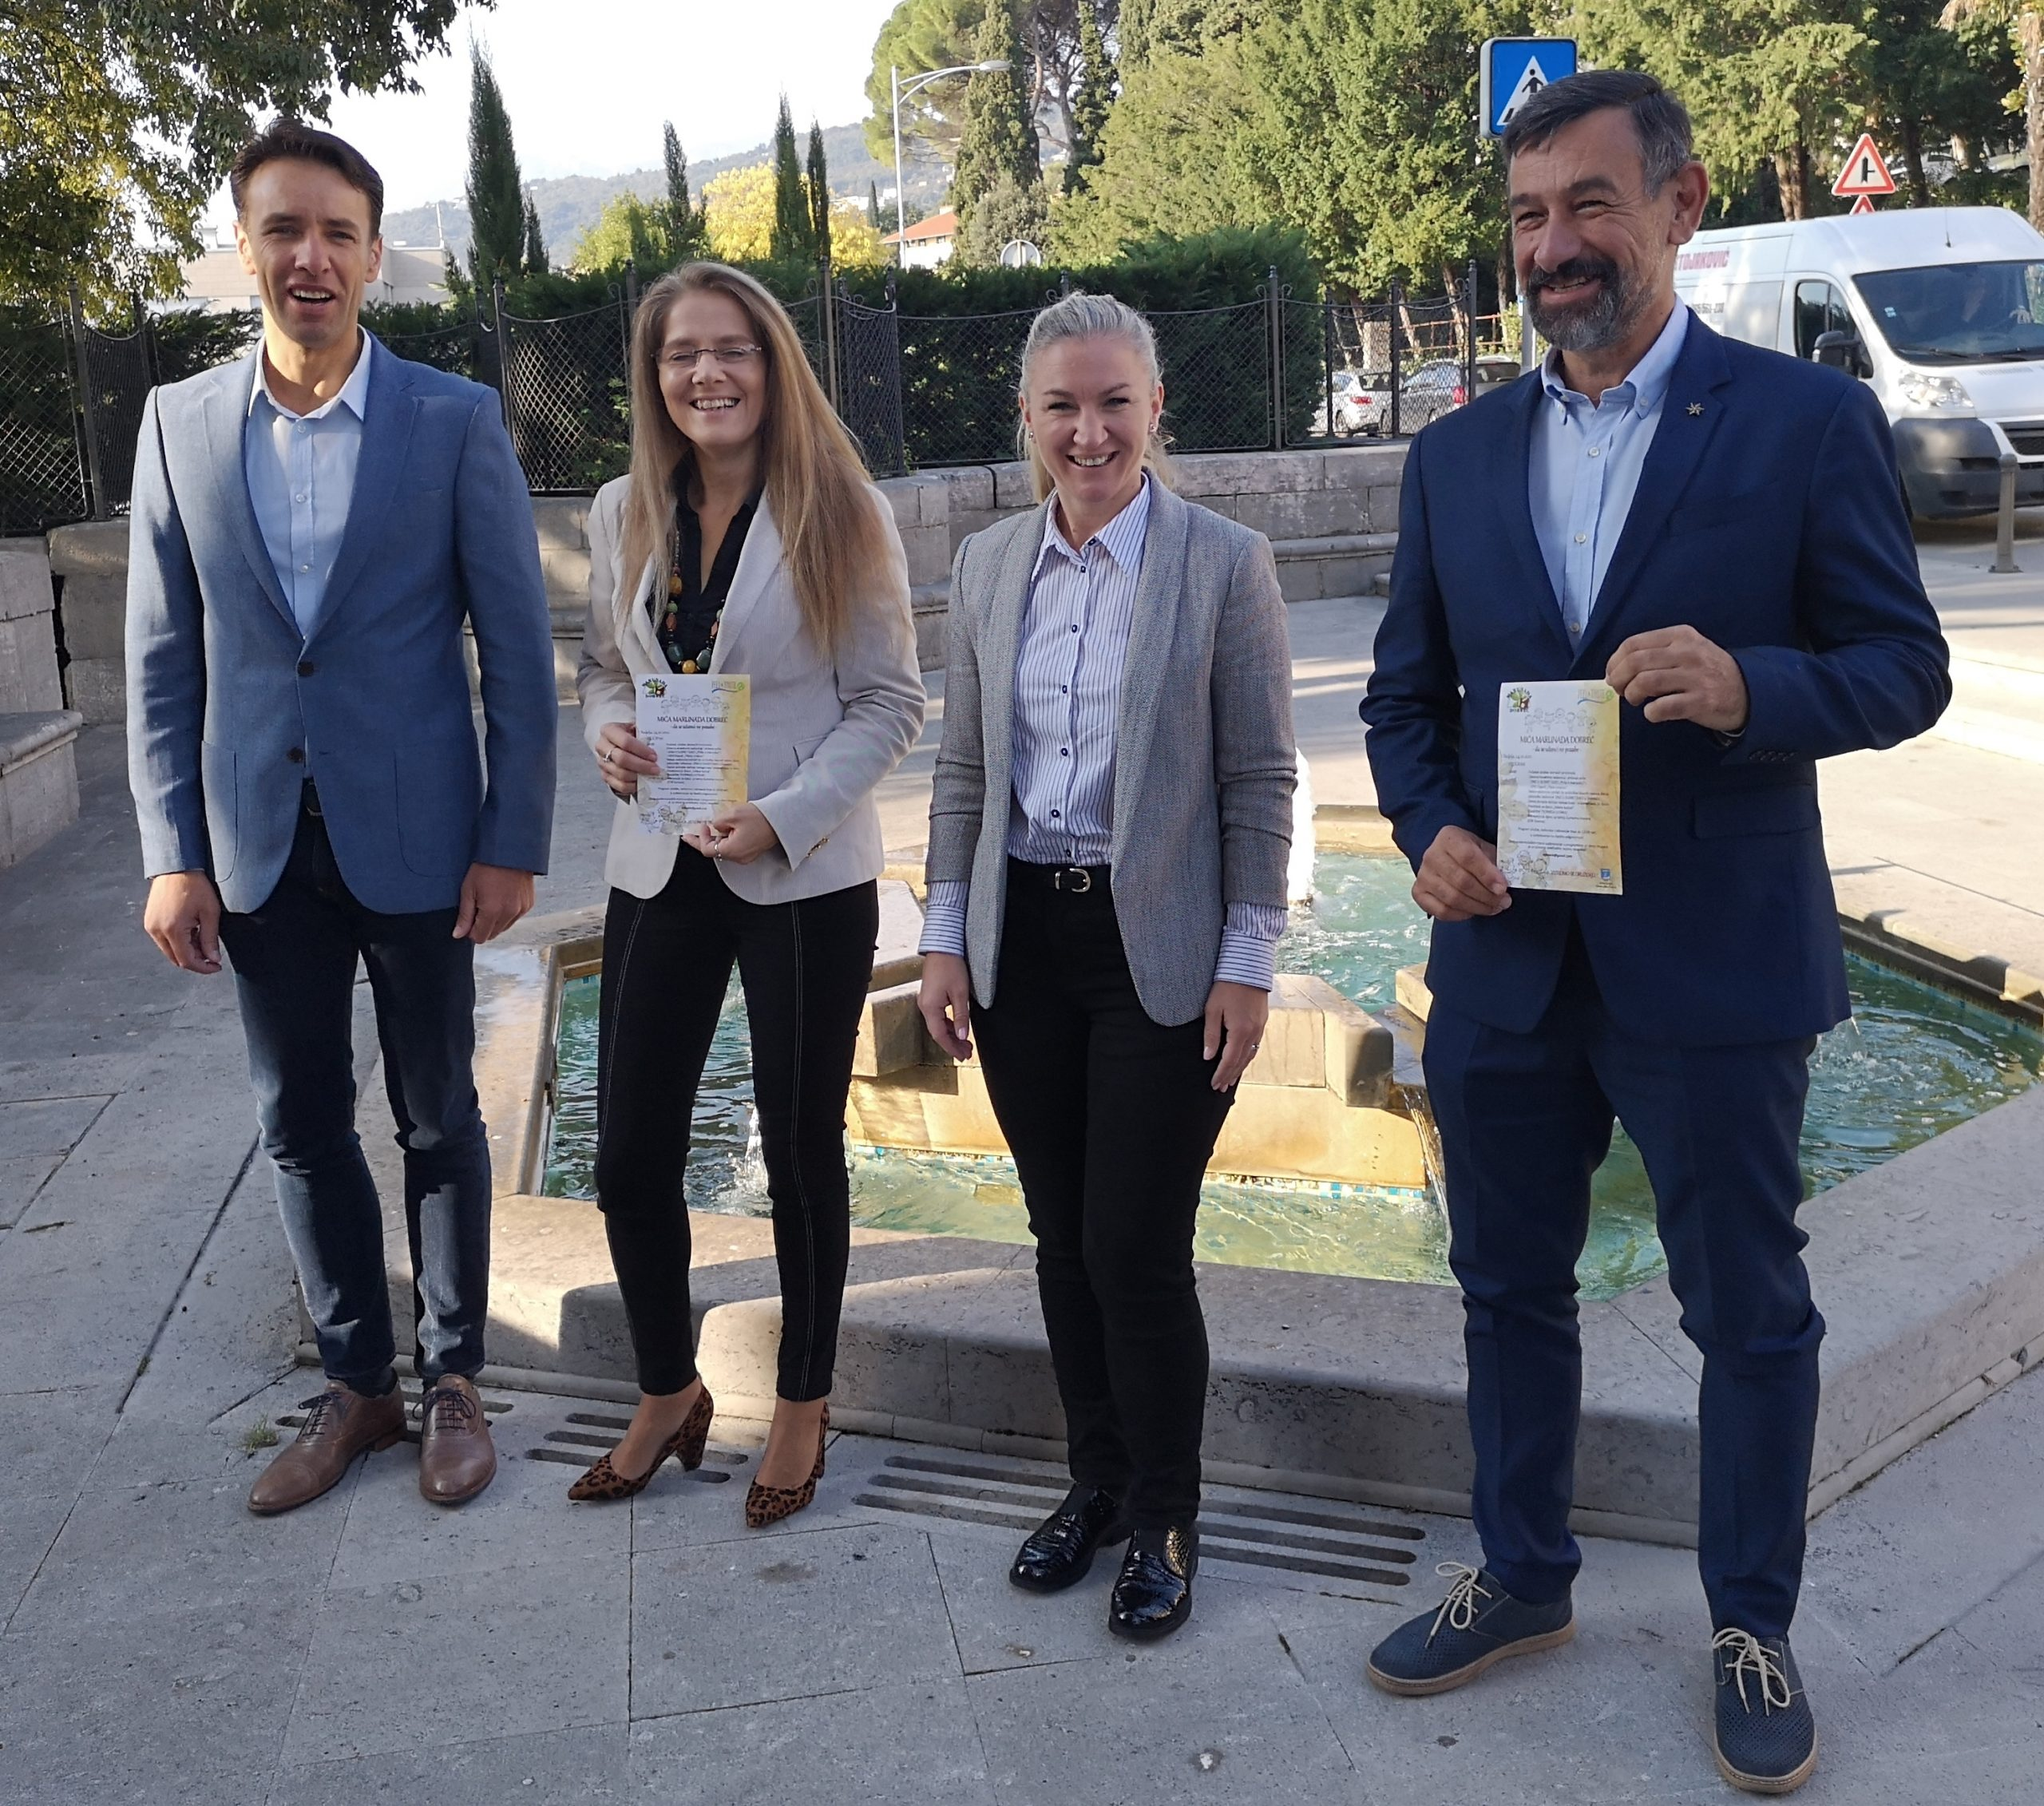 Fernando Kirigin, Lorena Bašan, Kristina Đukić i Nedo Pinezić / Foto A. KUĆEL-ILIĆ